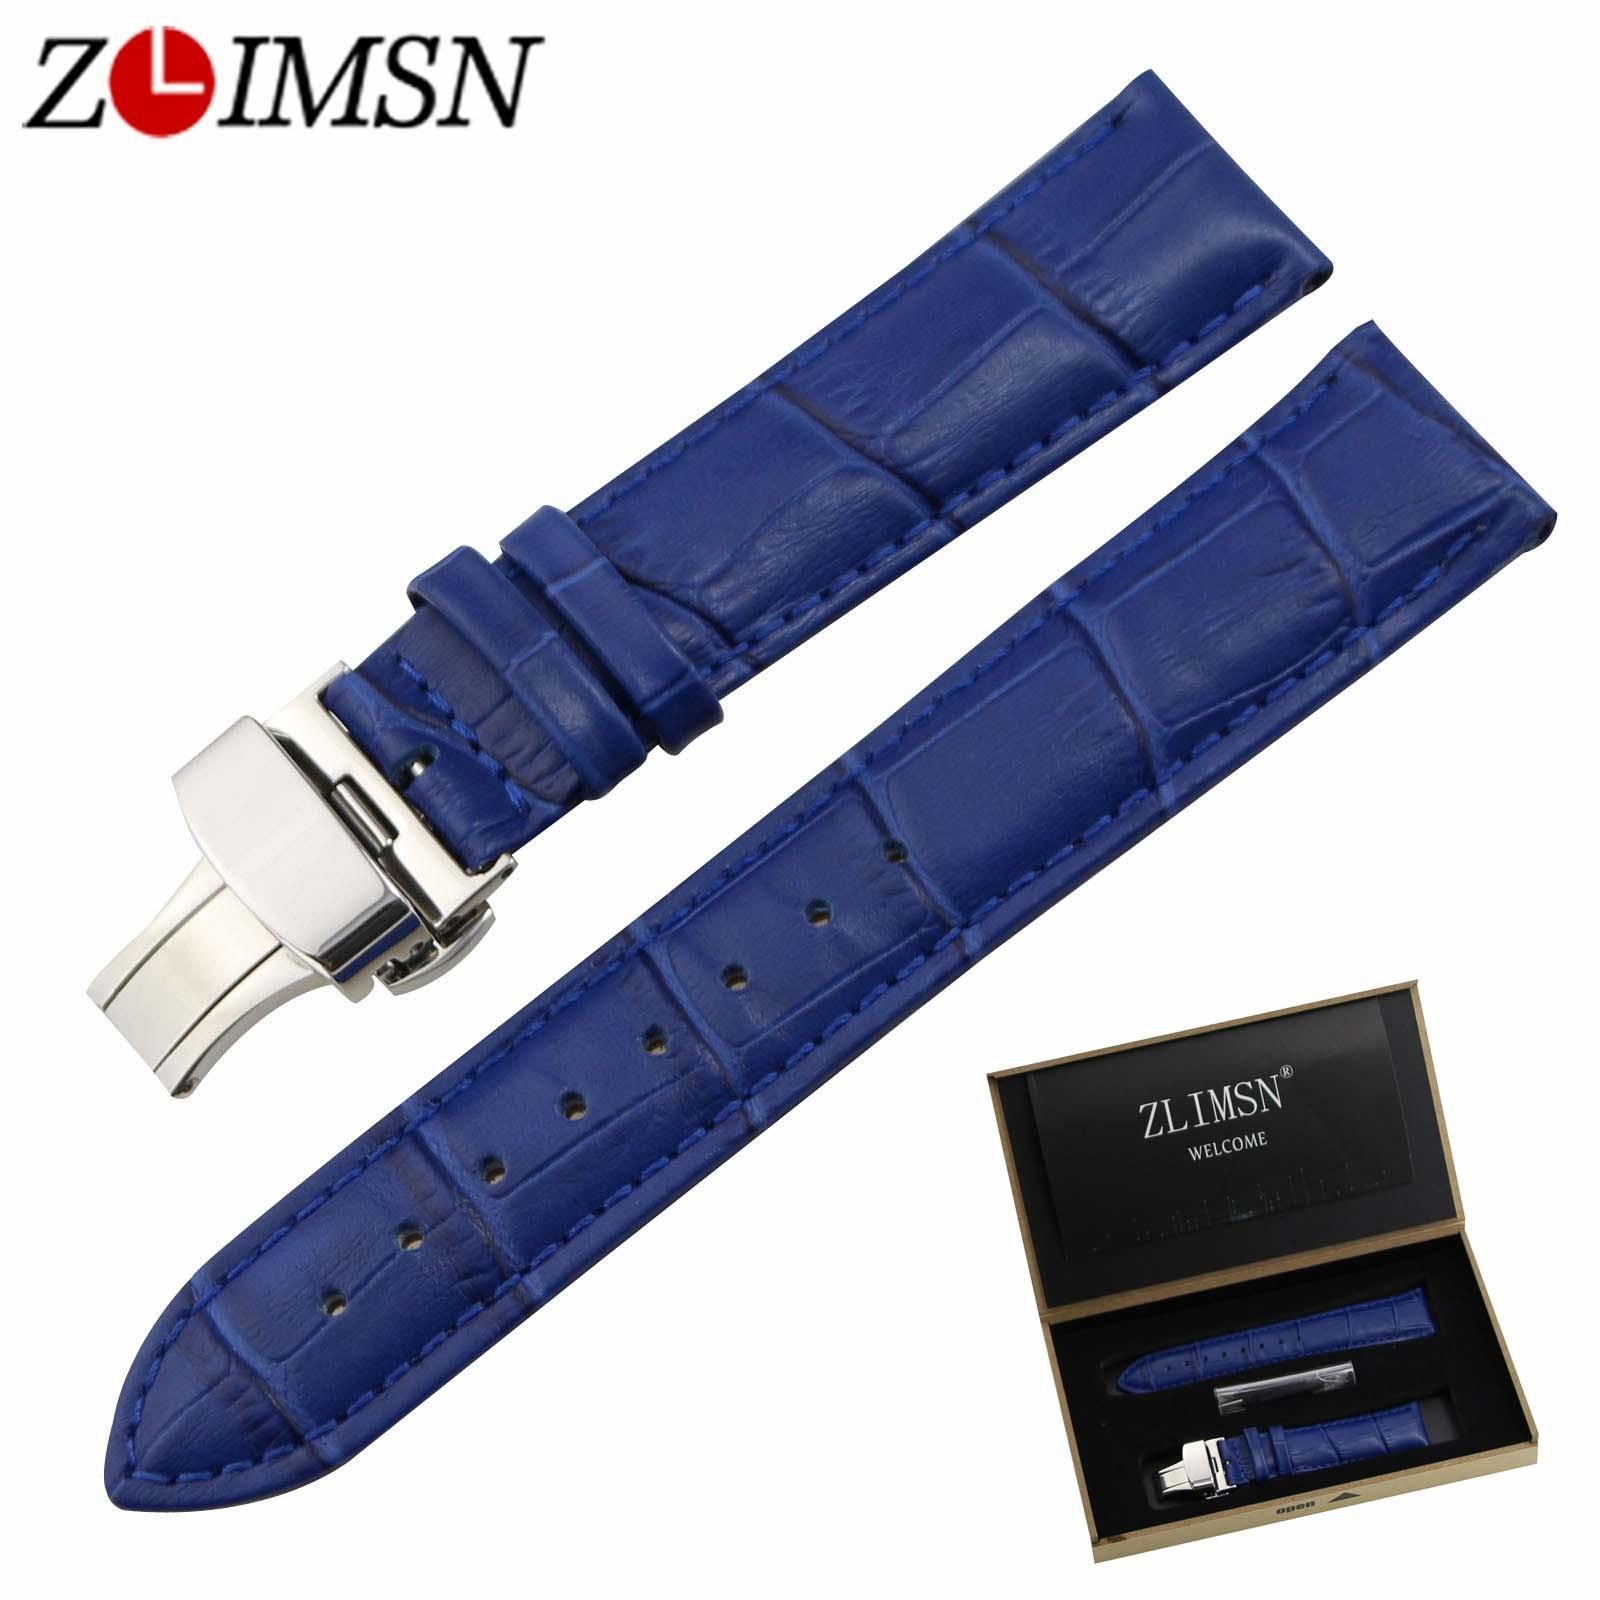 ZLIMSN 14mm 16mm 18mm 20mm High Quality Genuine Leather Watch Bands Blue  Crocodile Grain Strap Butterfly Deployment Clasp 18mm buckle 16mm women top grade high quality genuine leather watch bands strap b44